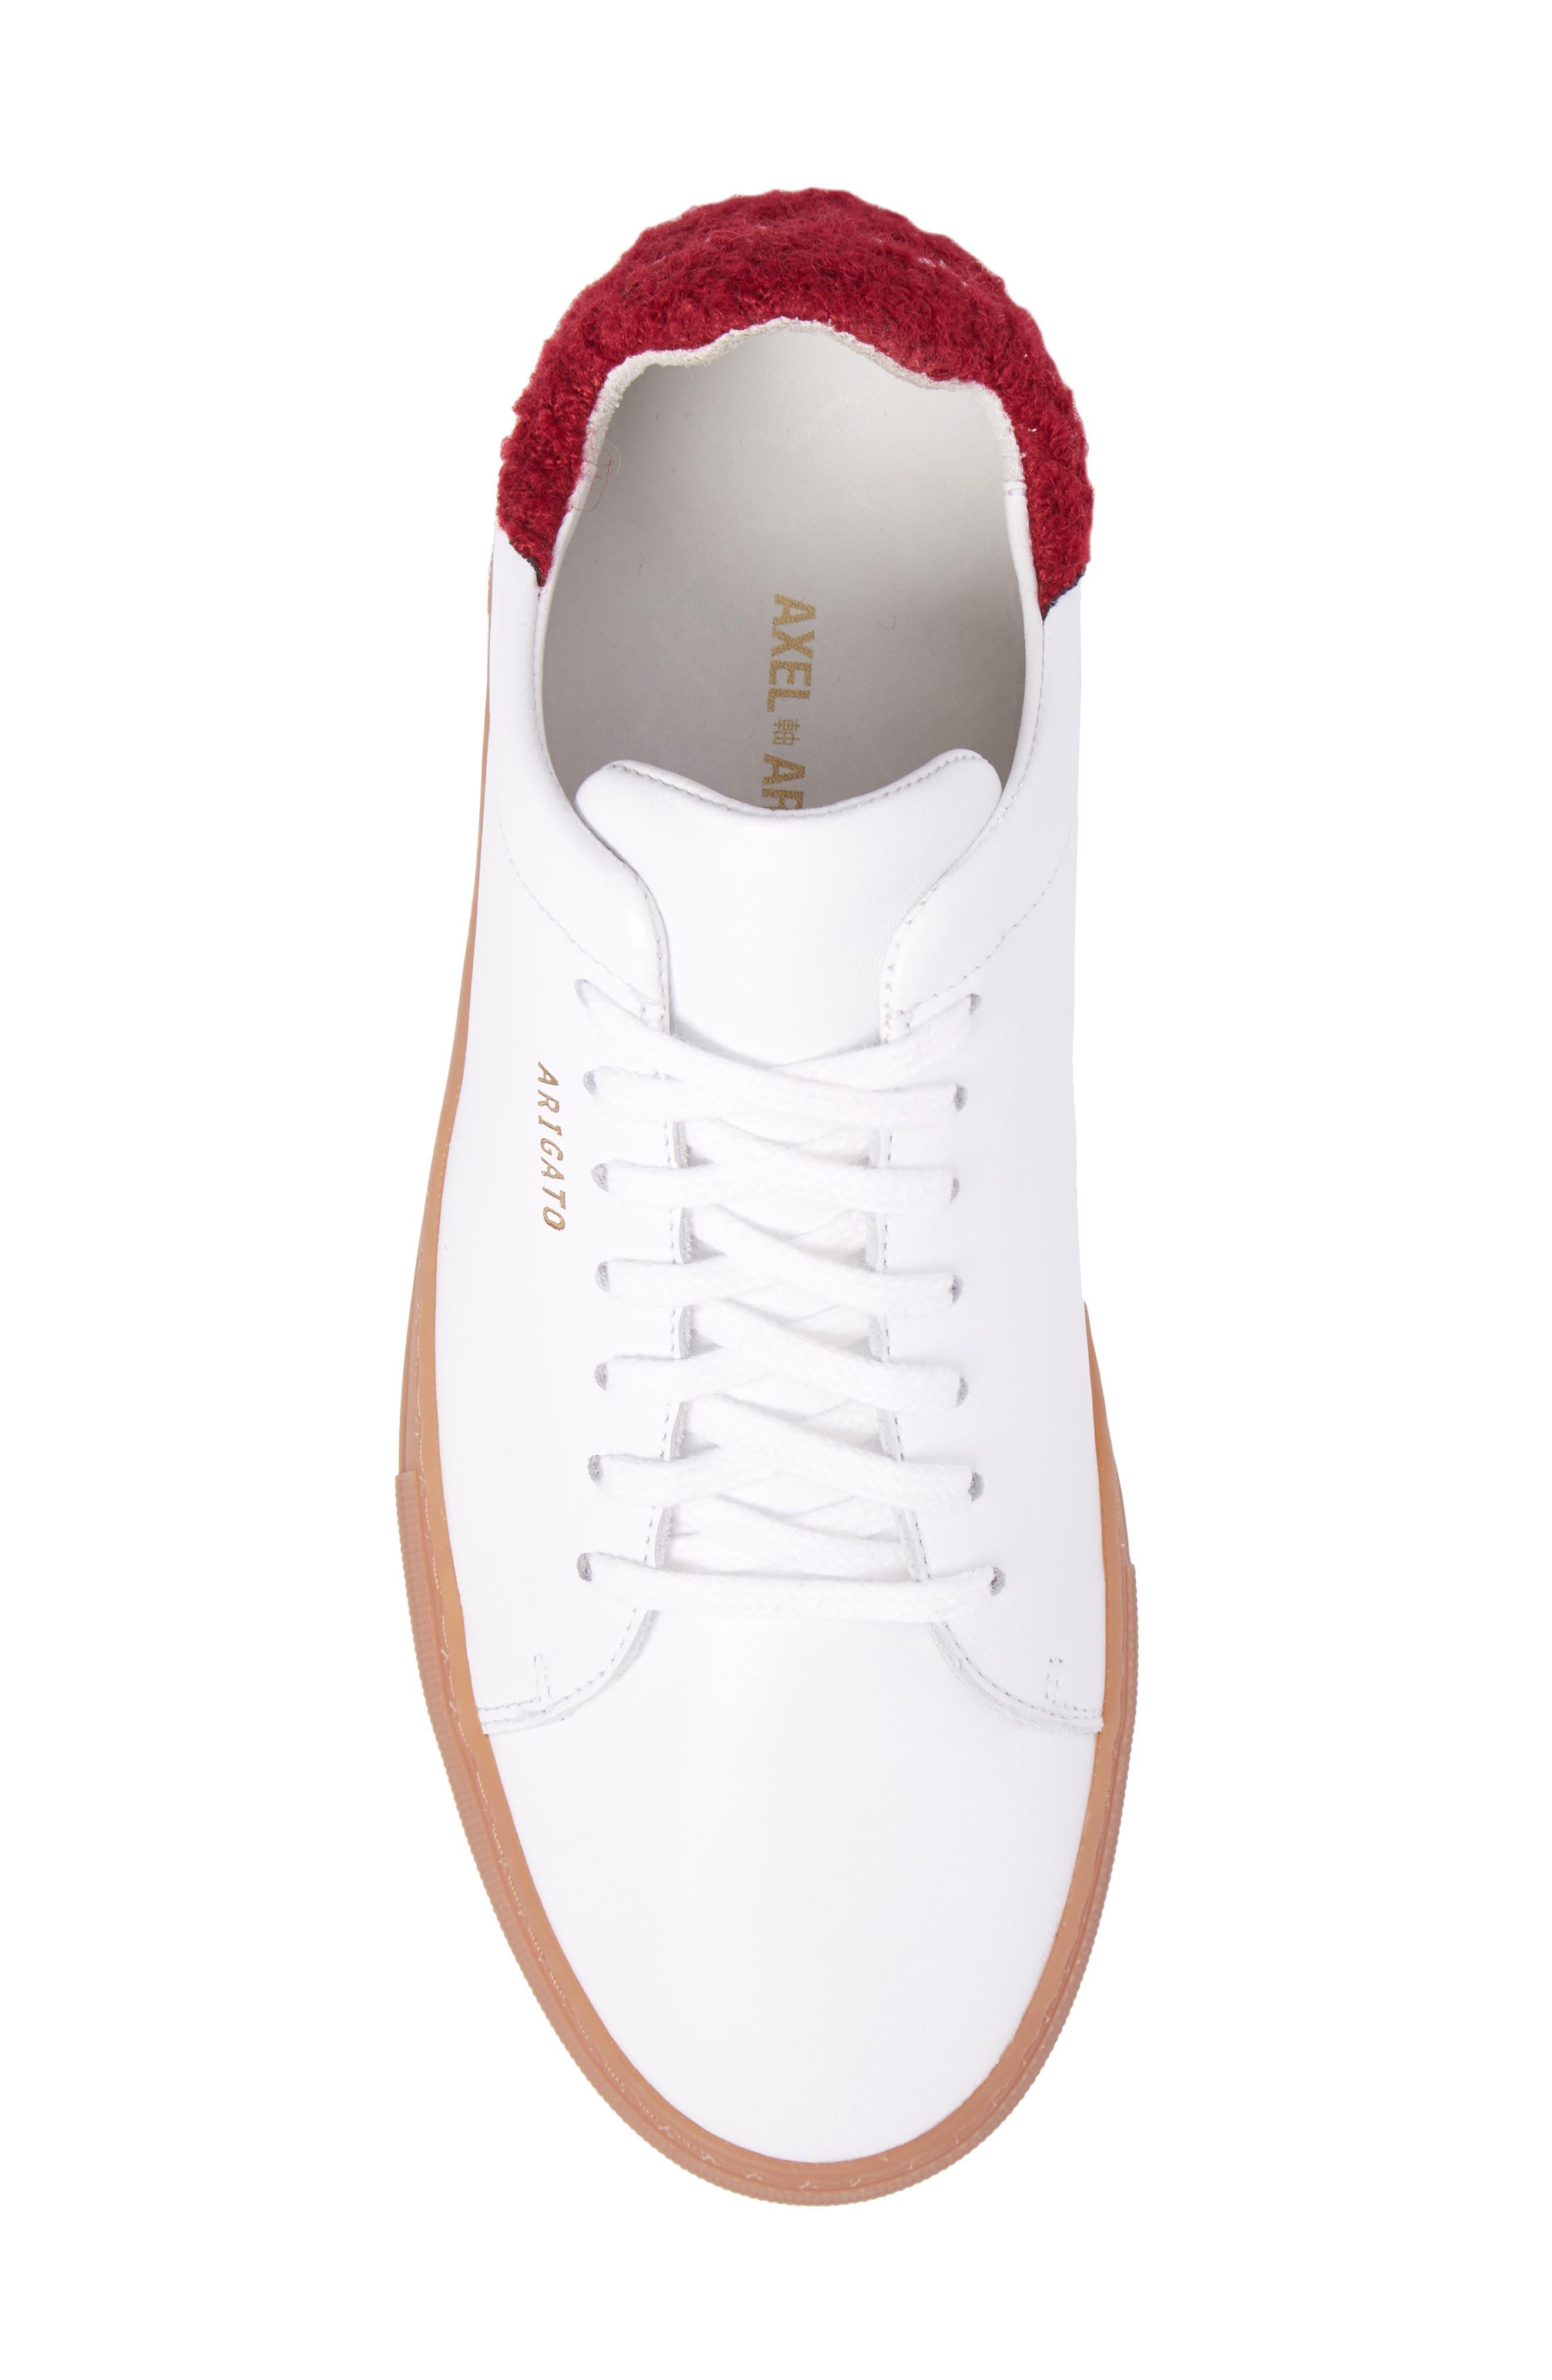 Clean 360 Fuzzy Heel Sneaker,                             Alternate thumbnail 5, color,                             100